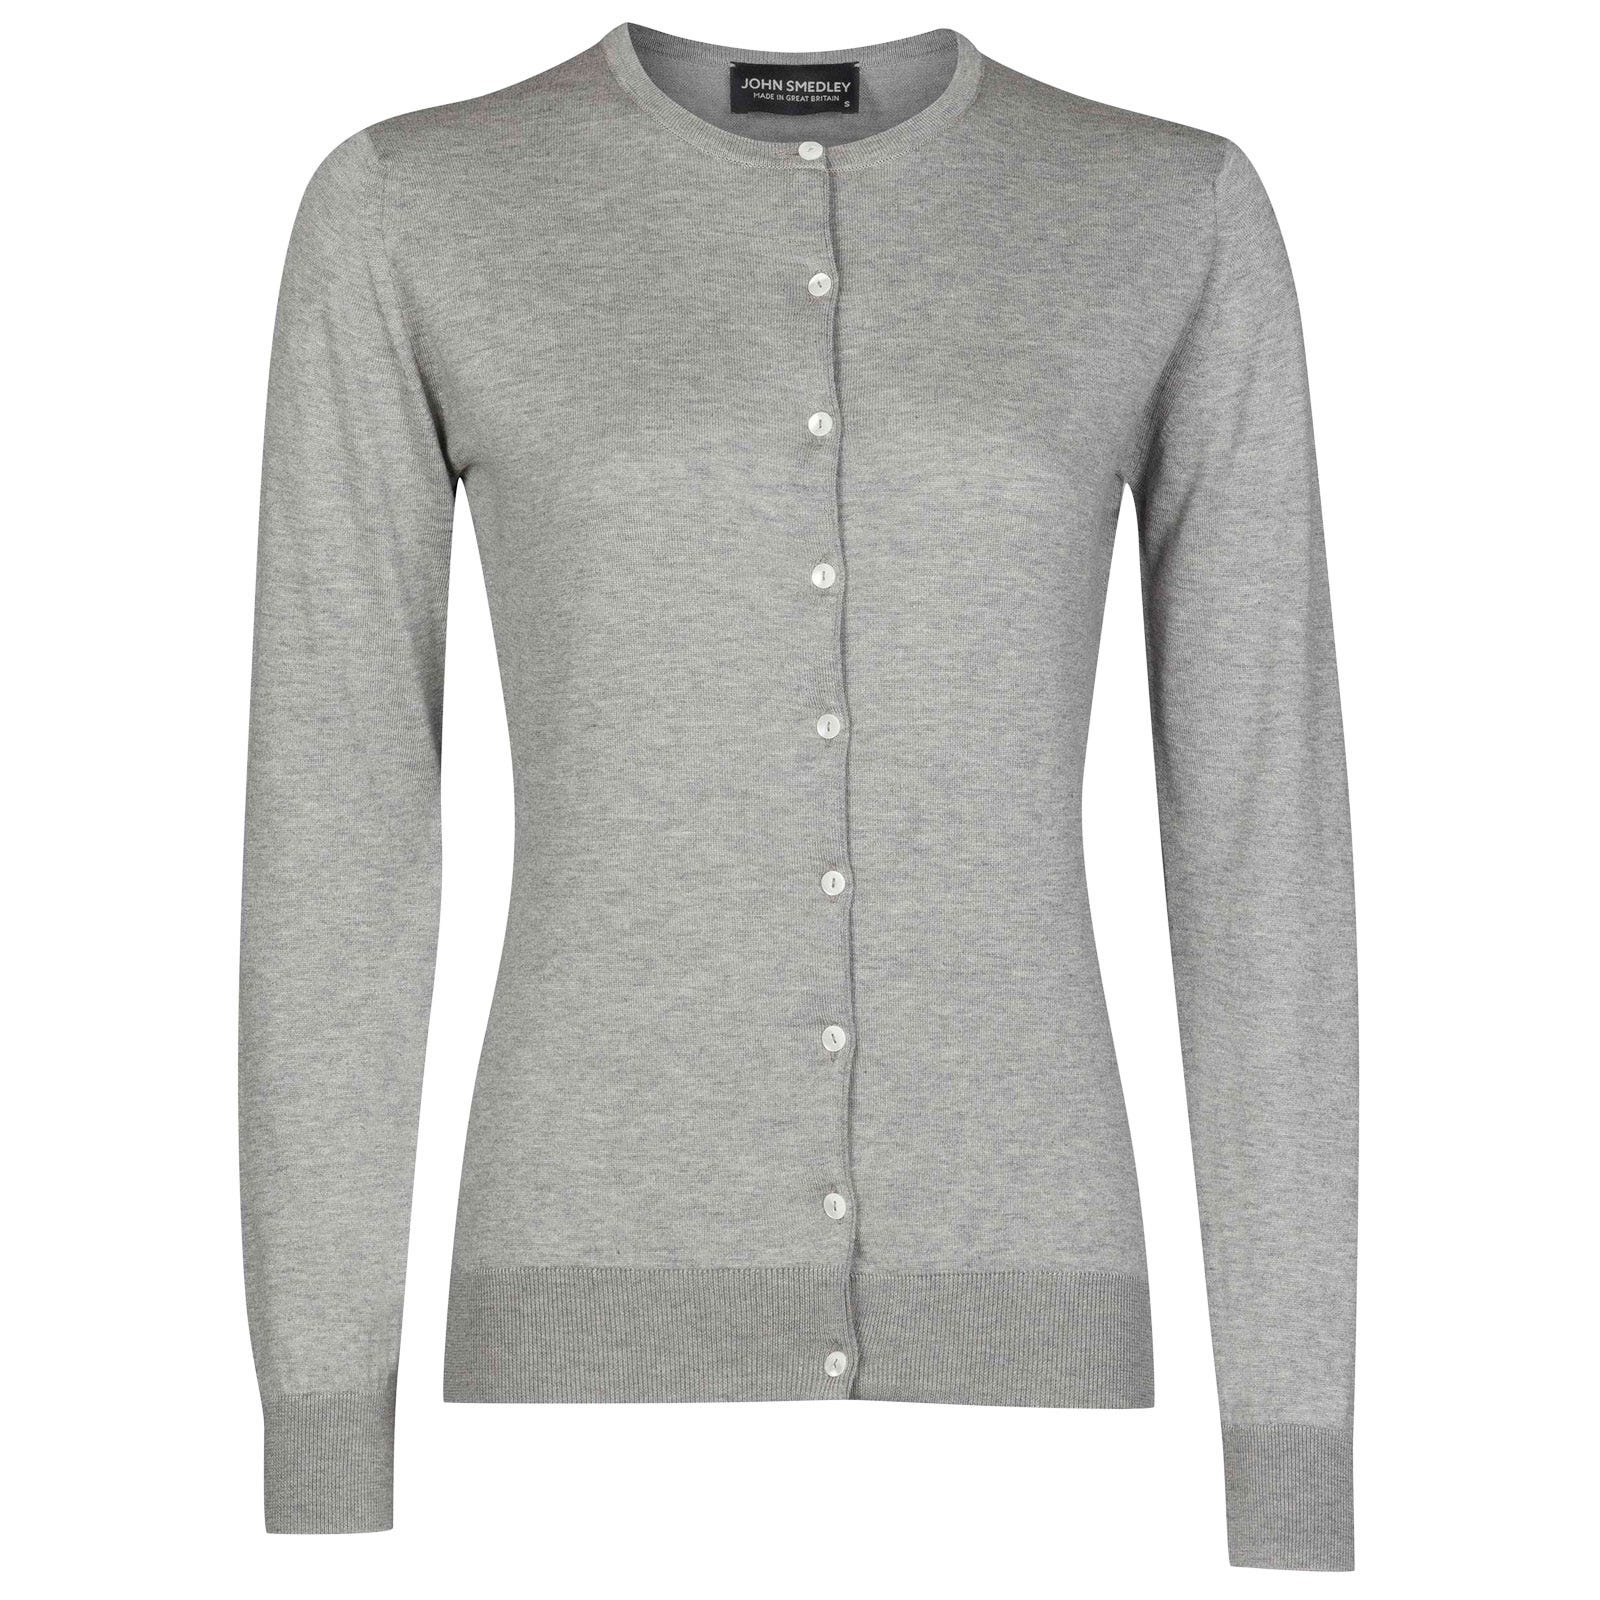 John Smedley Islington Sea Island Cotton Cardigan in Silver-XL